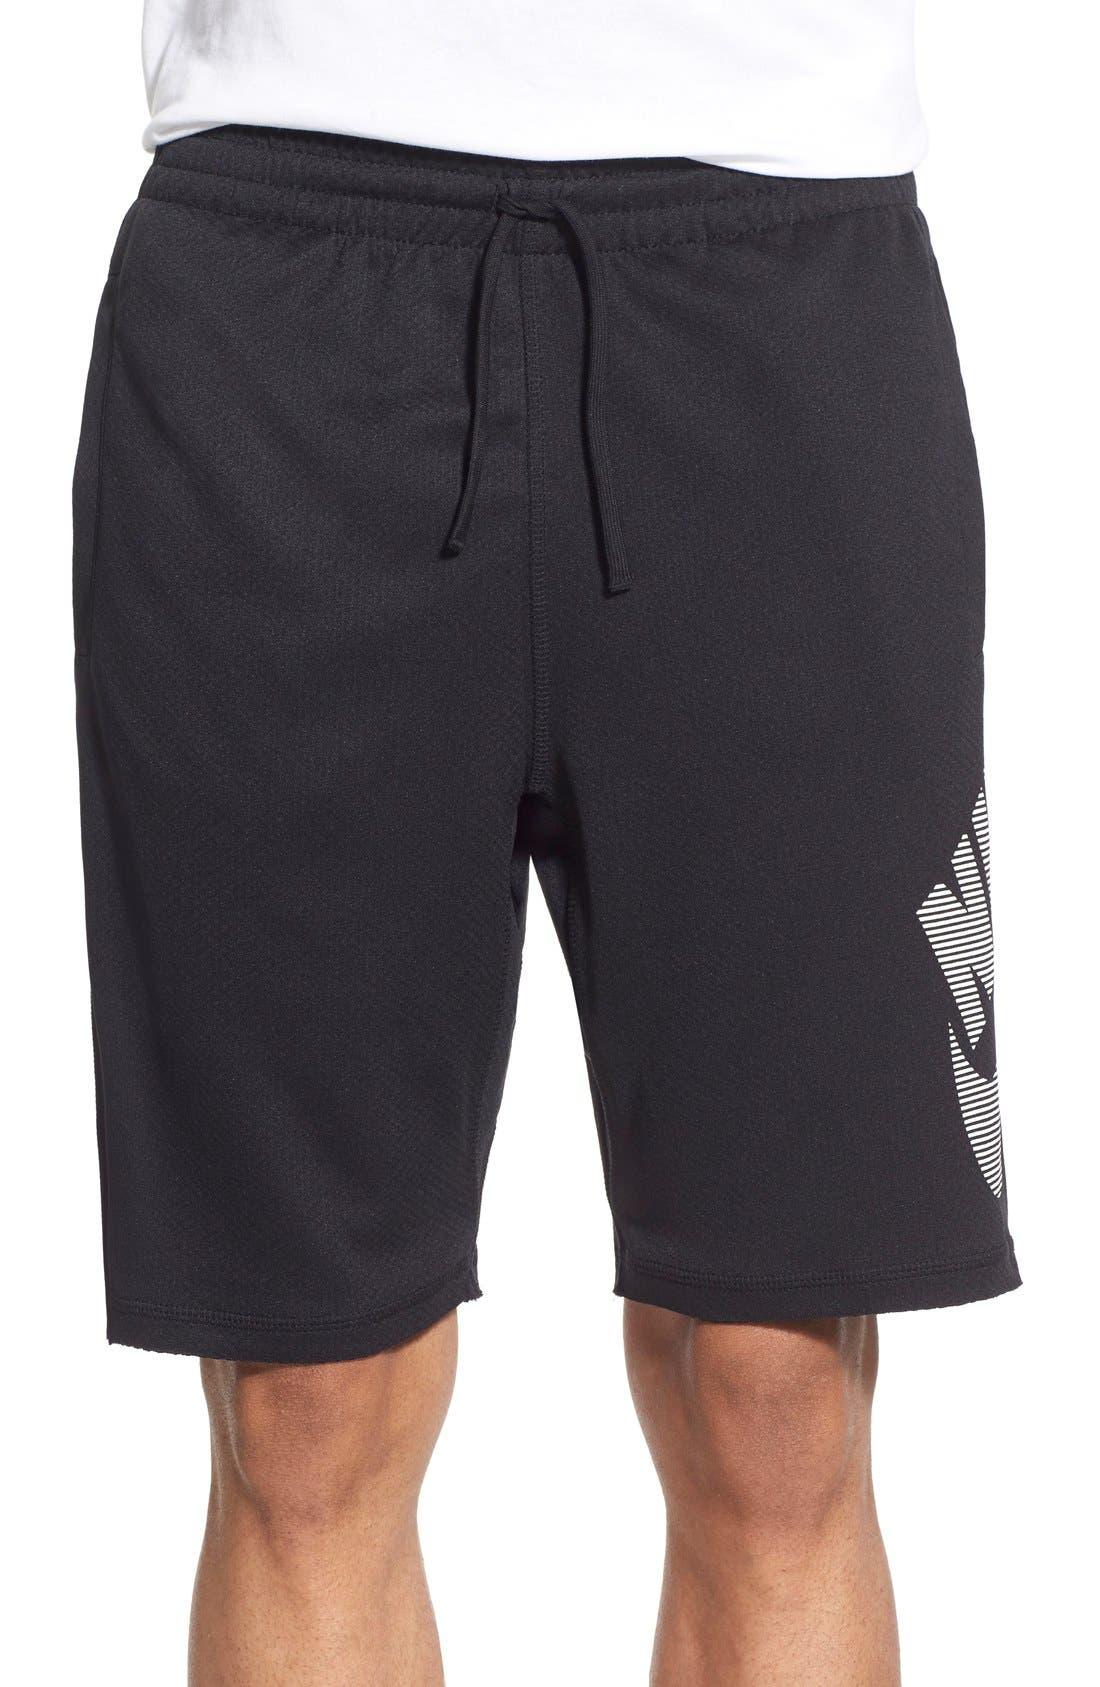 Alternate Image 1 Selected - Nike SB 'Stripe Sunday' Dri-FIT Shorts